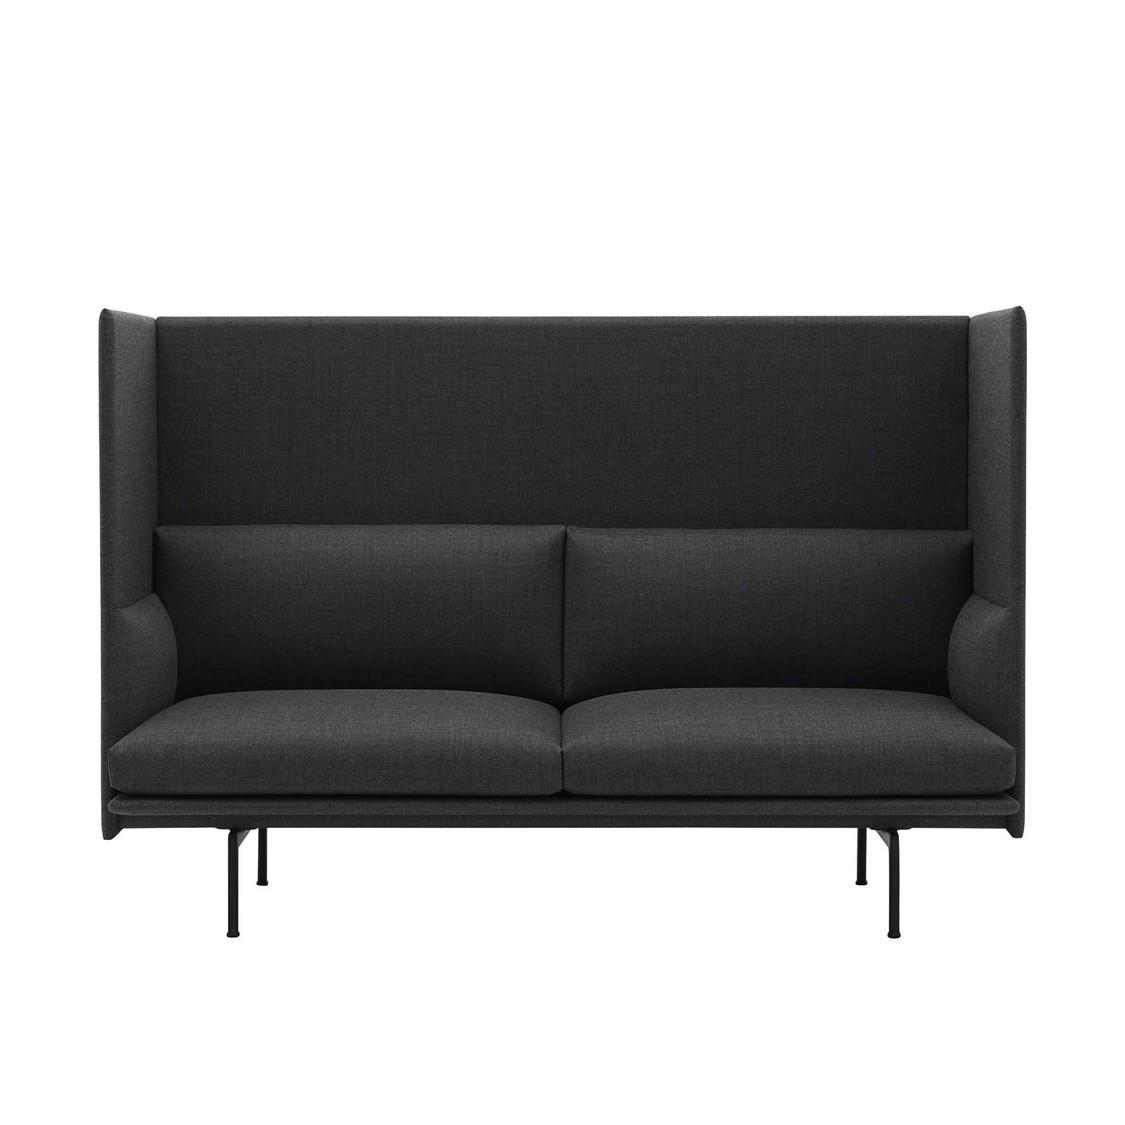 Outline Highback Sofa 2 Seater